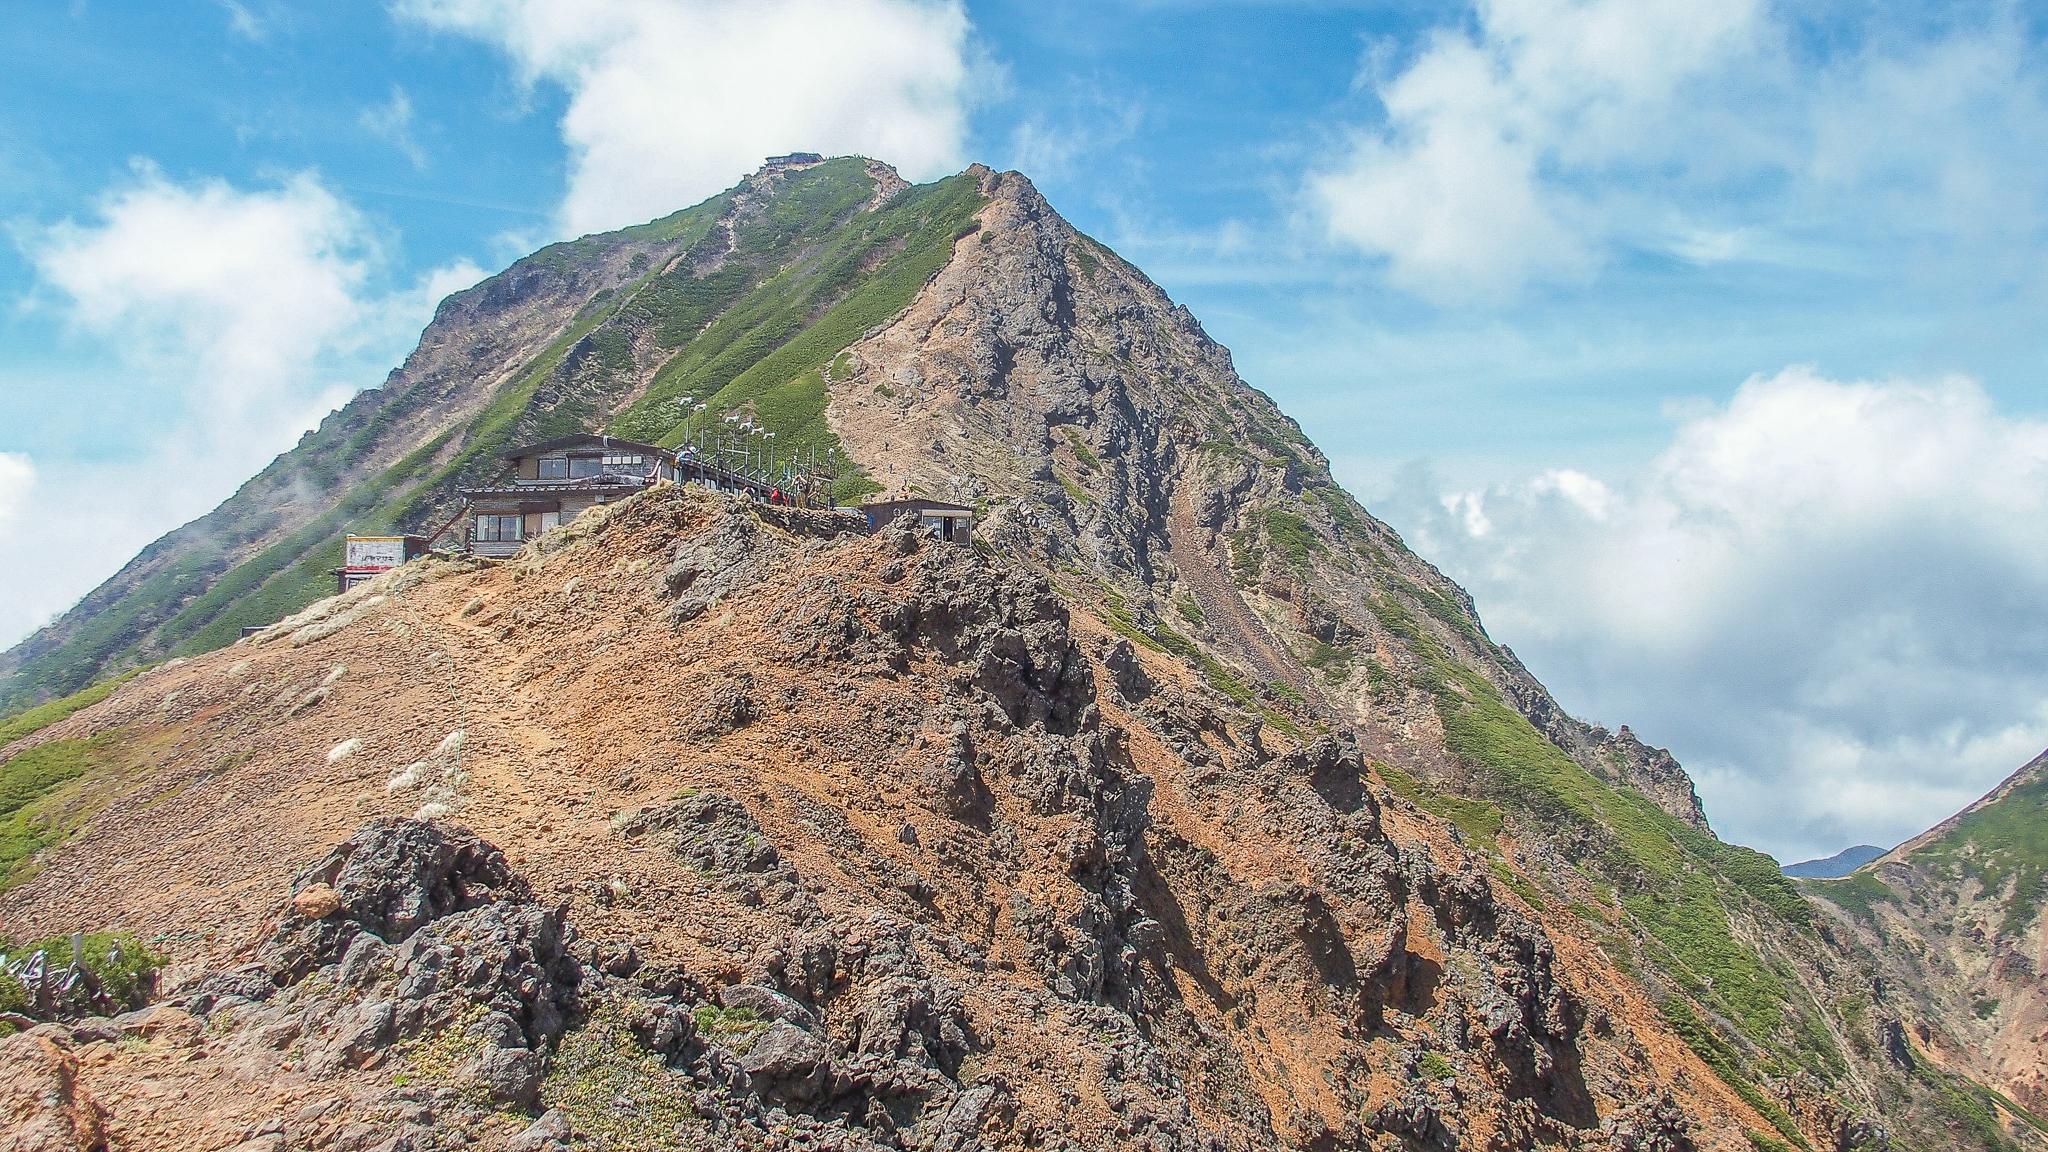 八ヶ岳(赤岳・横岳・硫黄岳)・赤岳展望荘と赤岳